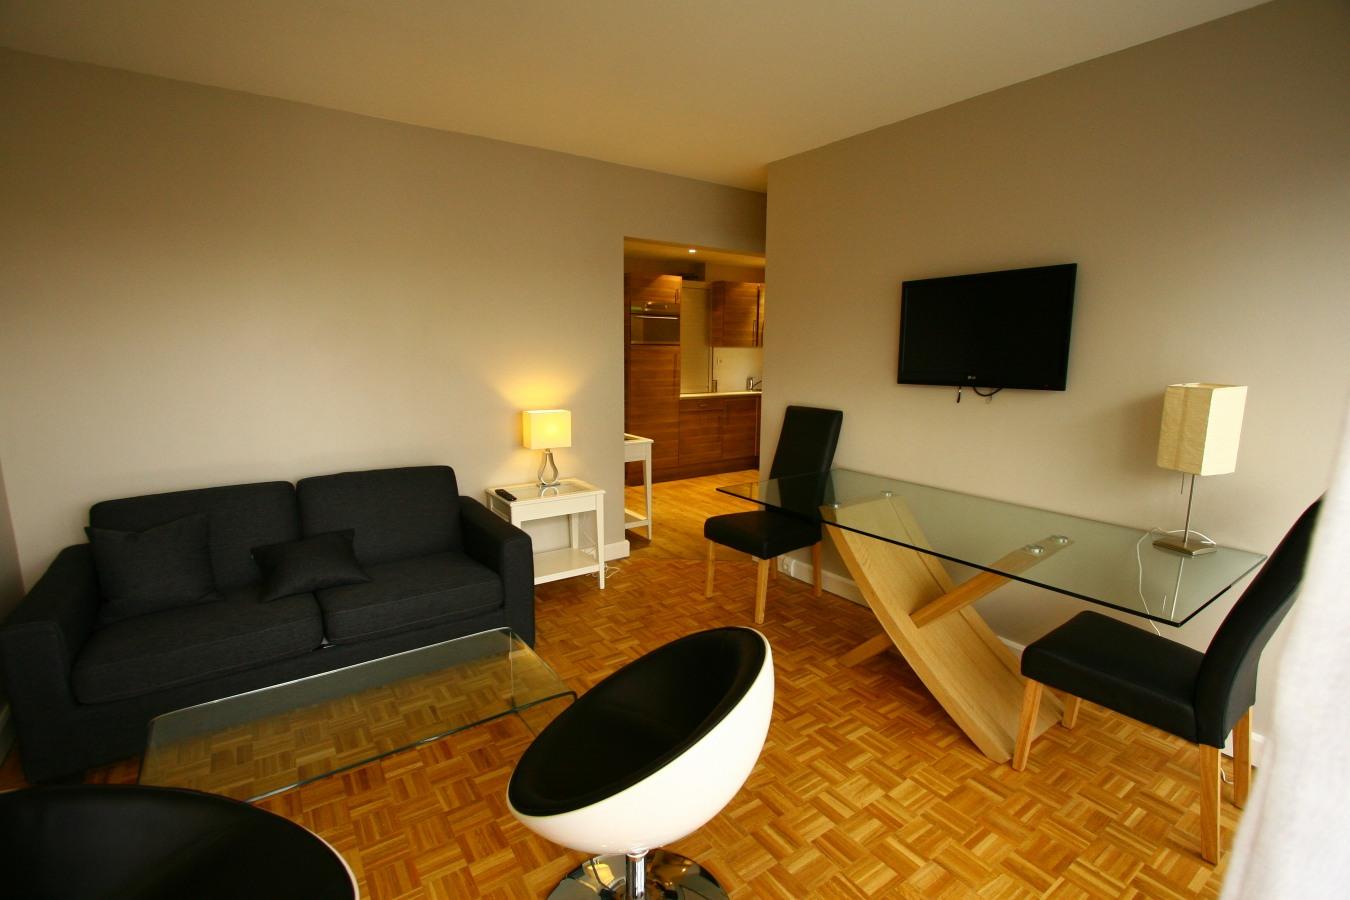 Hotel Convention Montparnasse - Appartamenti